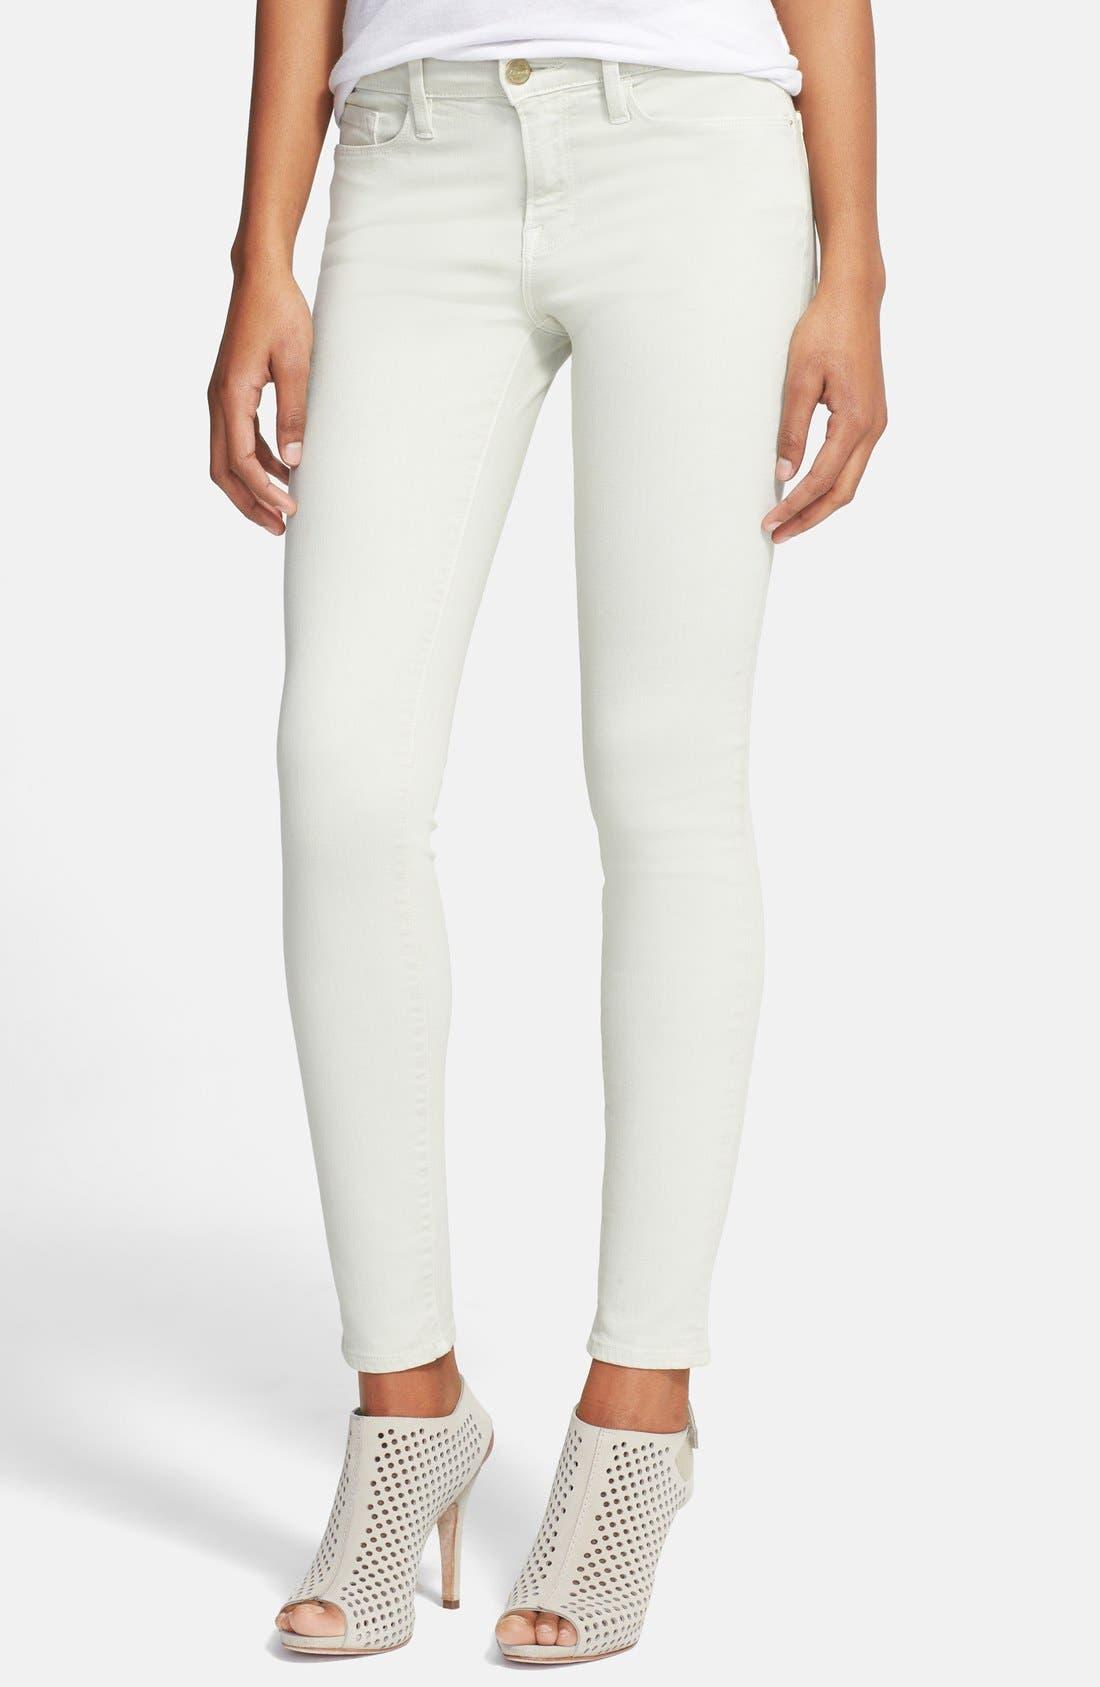 Alternate Image 1 Selected - FRAME 'Le Color' Skinny Jeans (Pale Mint)